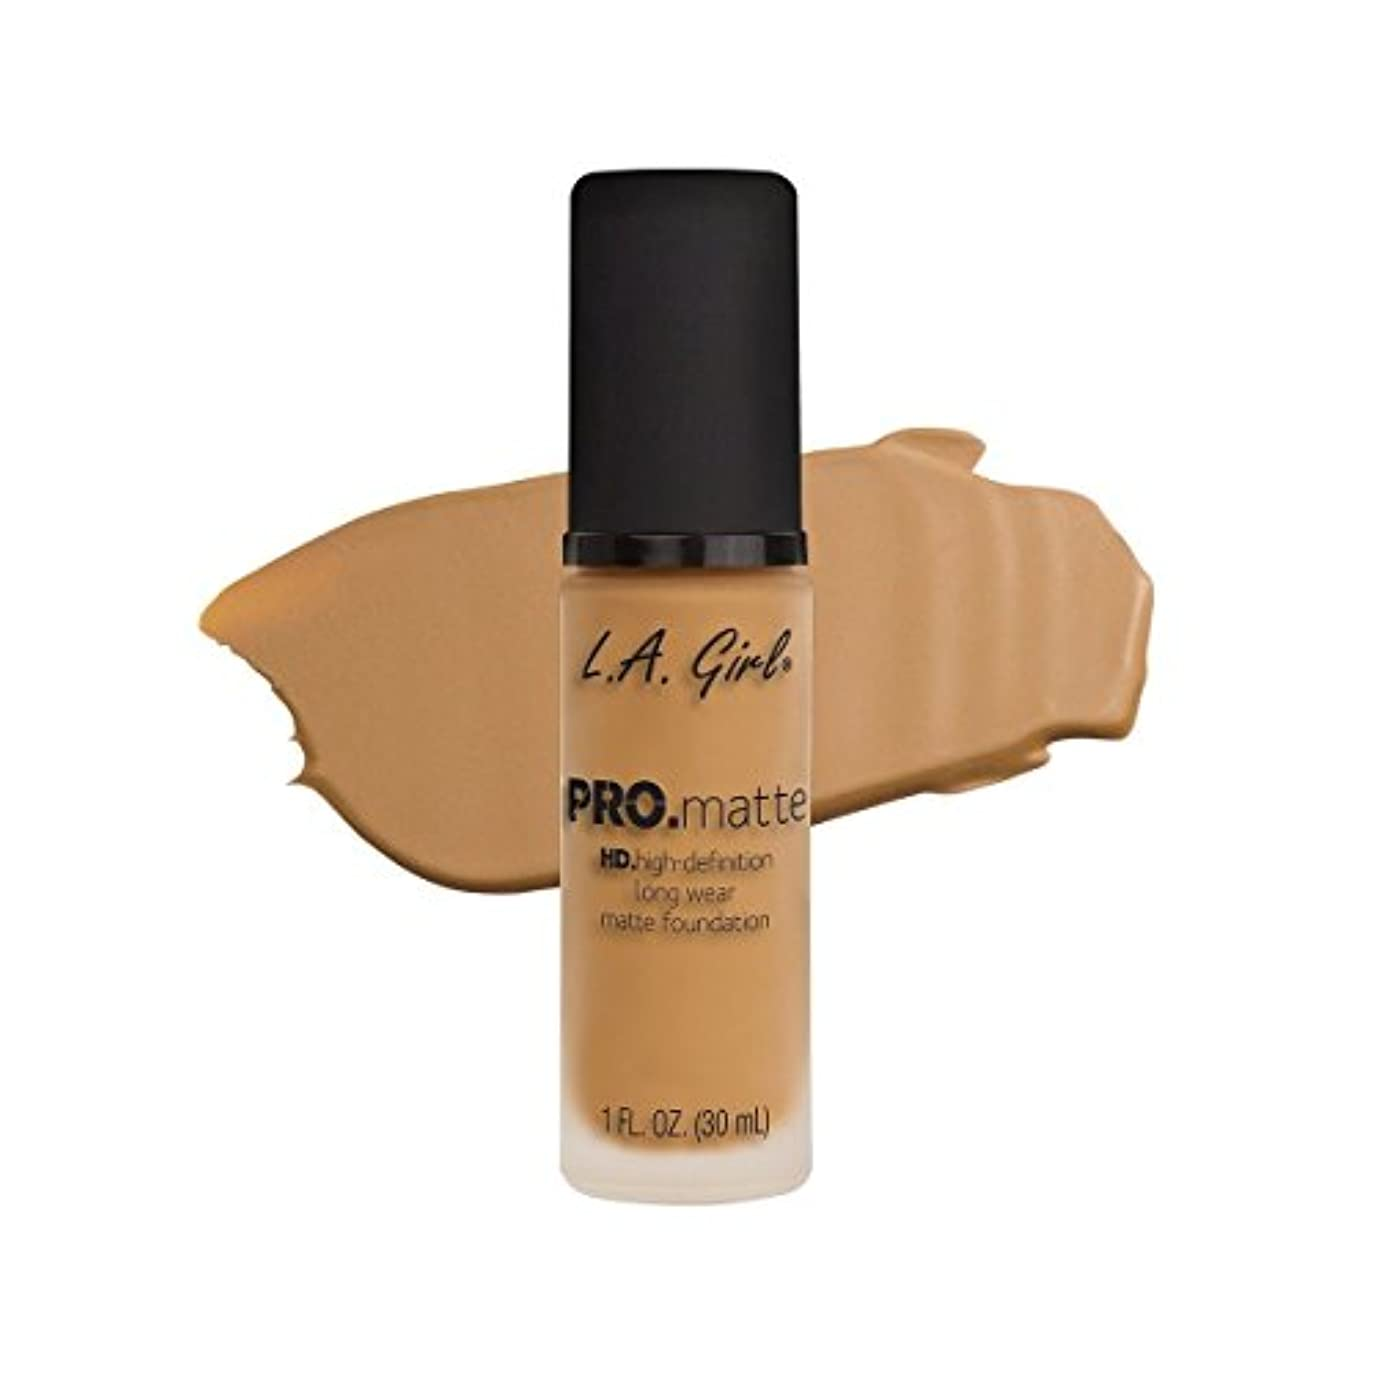 (3 Pack) L.A. GIRL Pro Matte Foundation - Light Tan (並行輸入品)